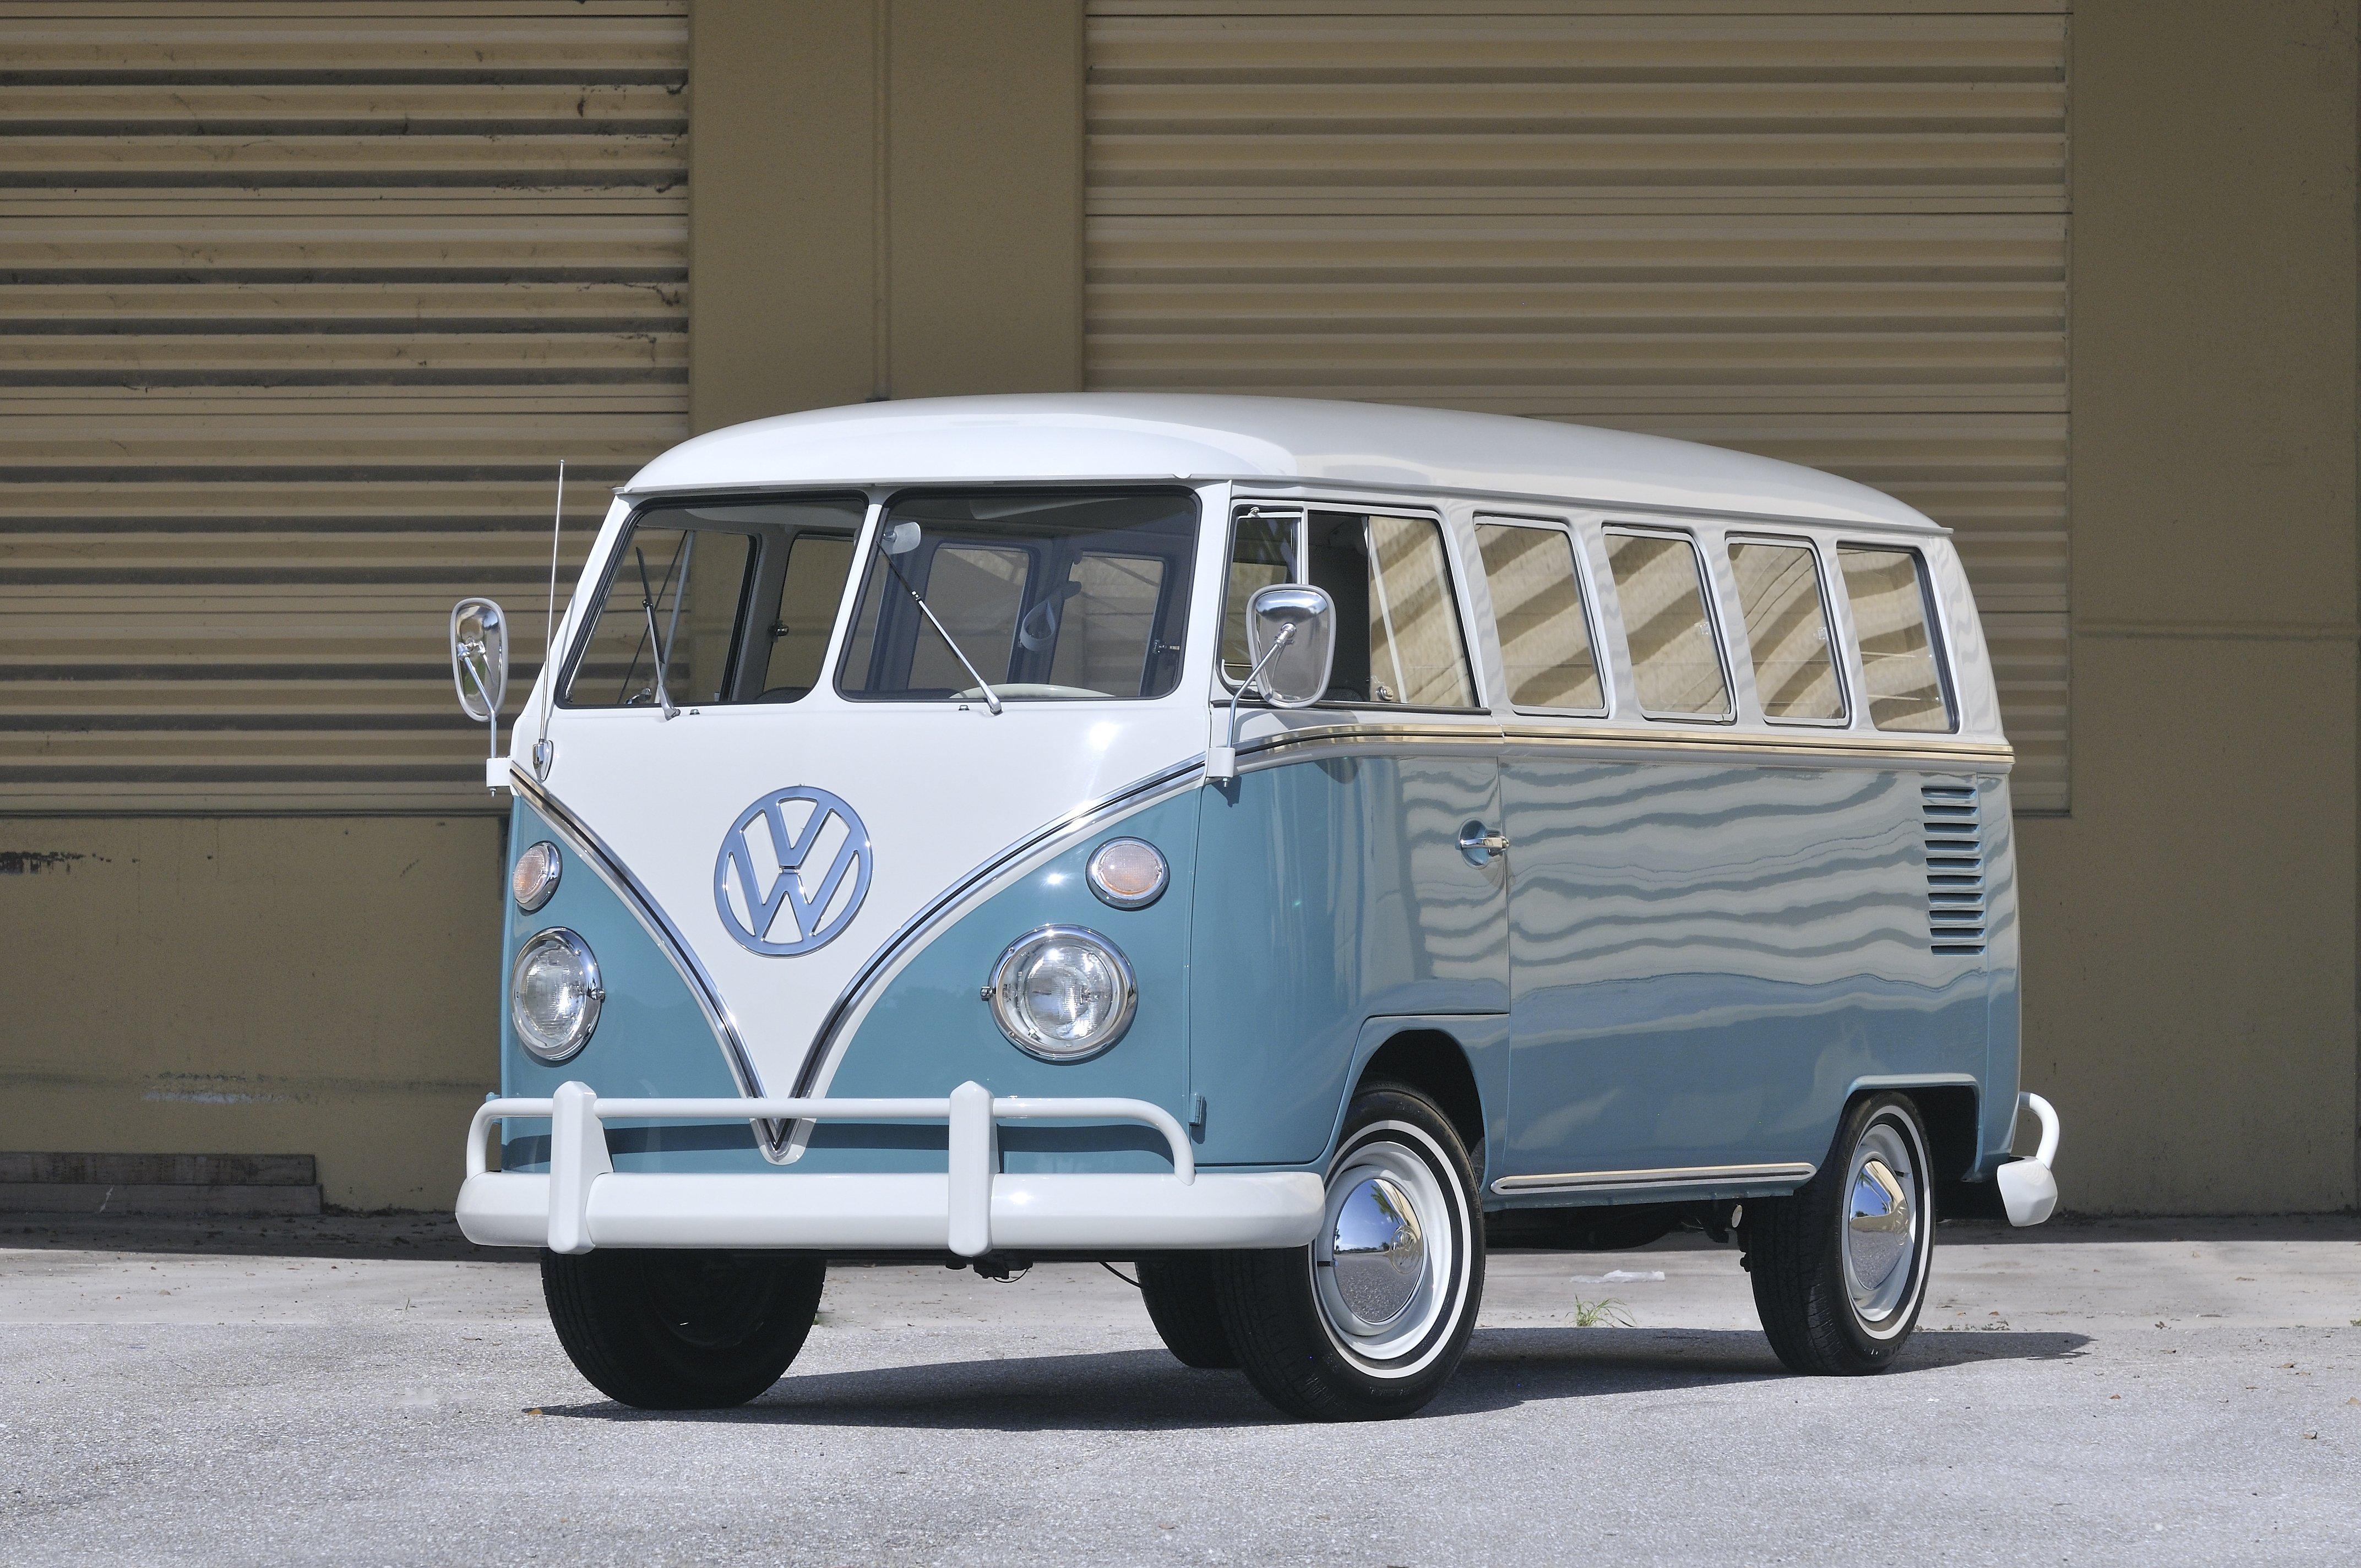 1967 volkswagen vw 13 window bus kombi classic old usa 4288x2848 05 wallpaper 4288x2848. Black Bedroom Furniture Sets. Home Design Ideas